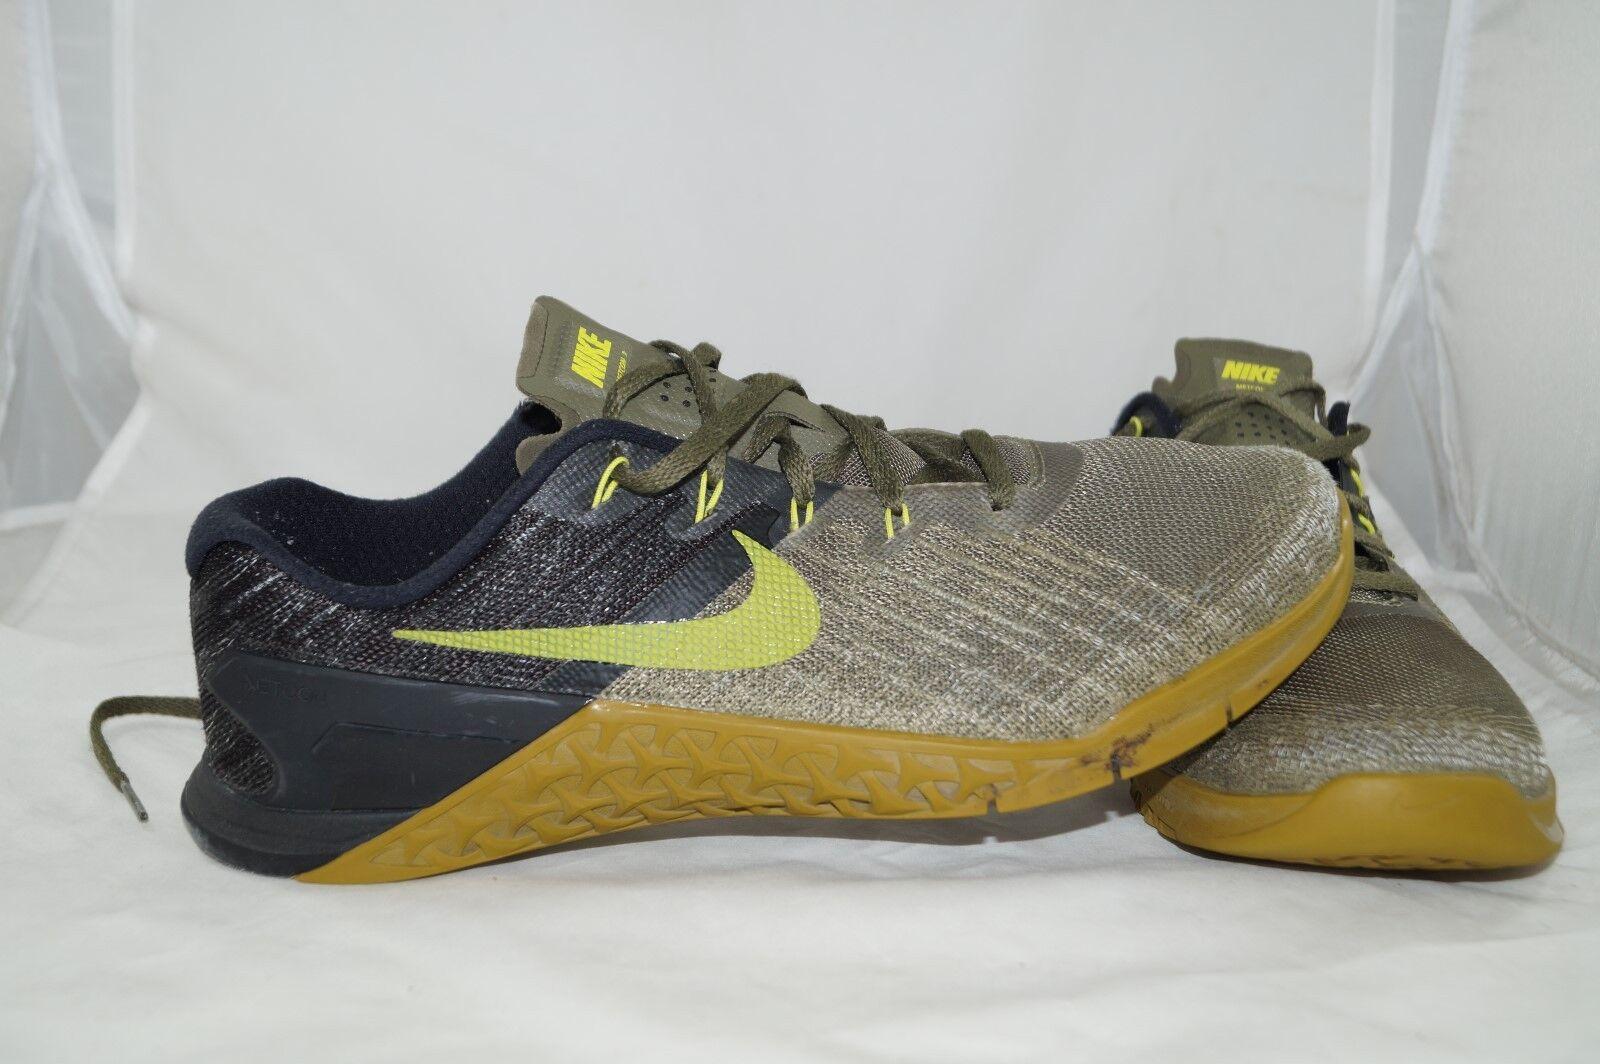 Nike SB Sneakers, Turnschuhe, Schuhe Gr. 40,5 neuwertig